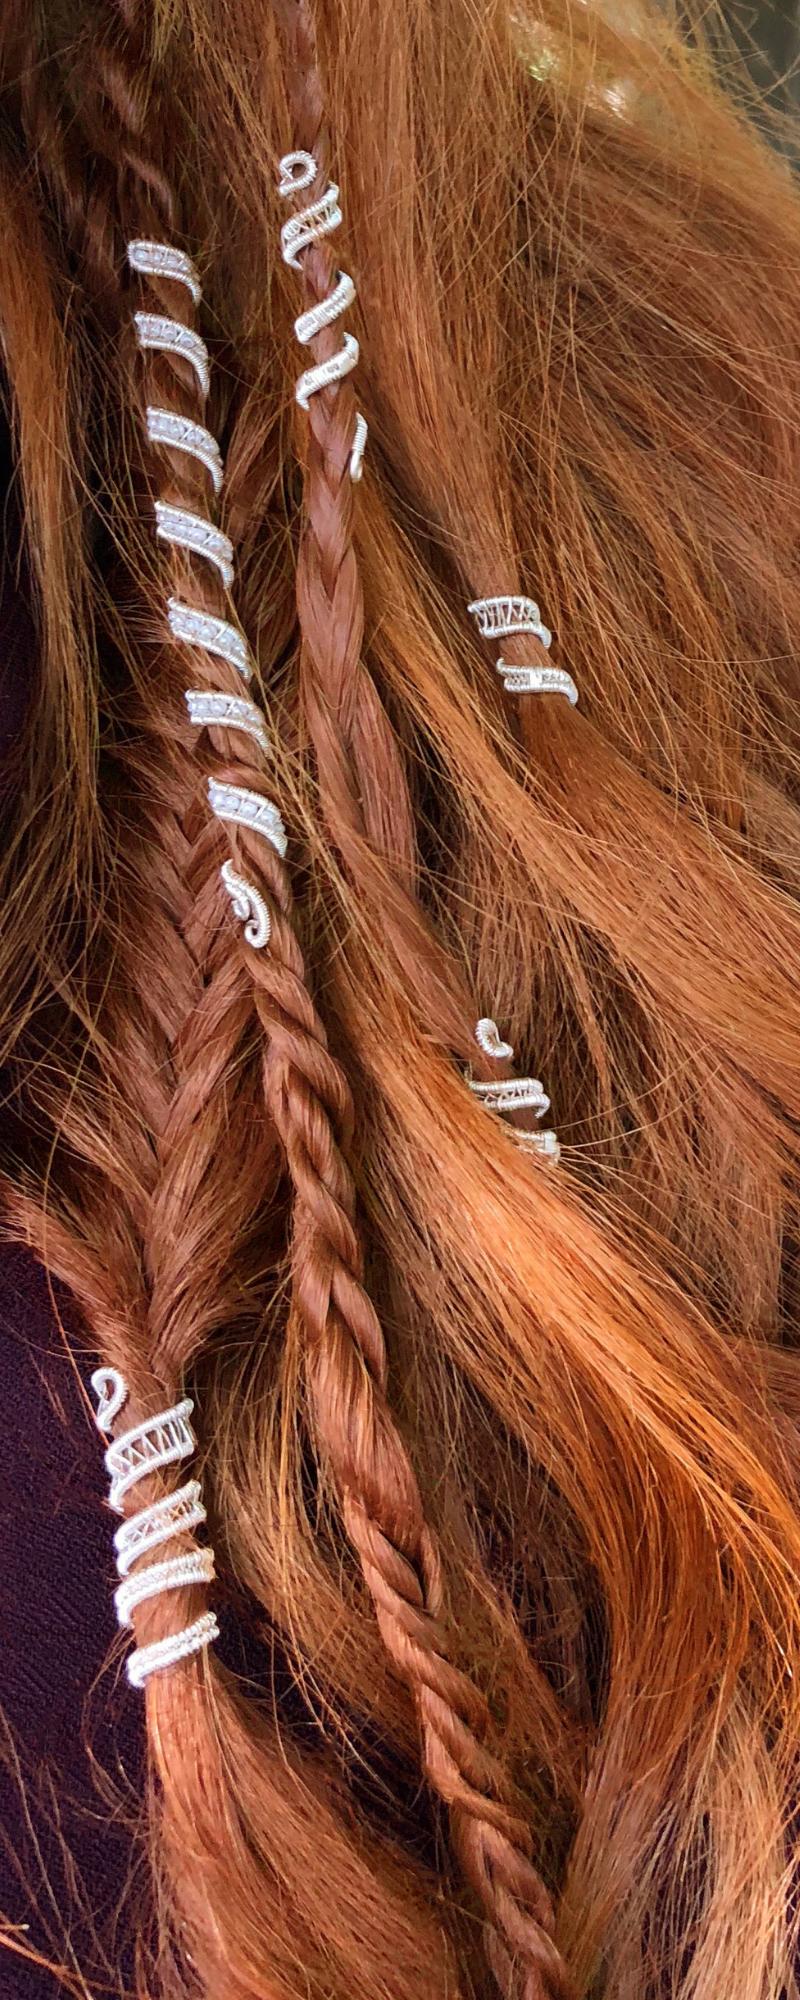 b0d89a0100 Custom made hair cuffs great for braids or dreads | Beautiful ...